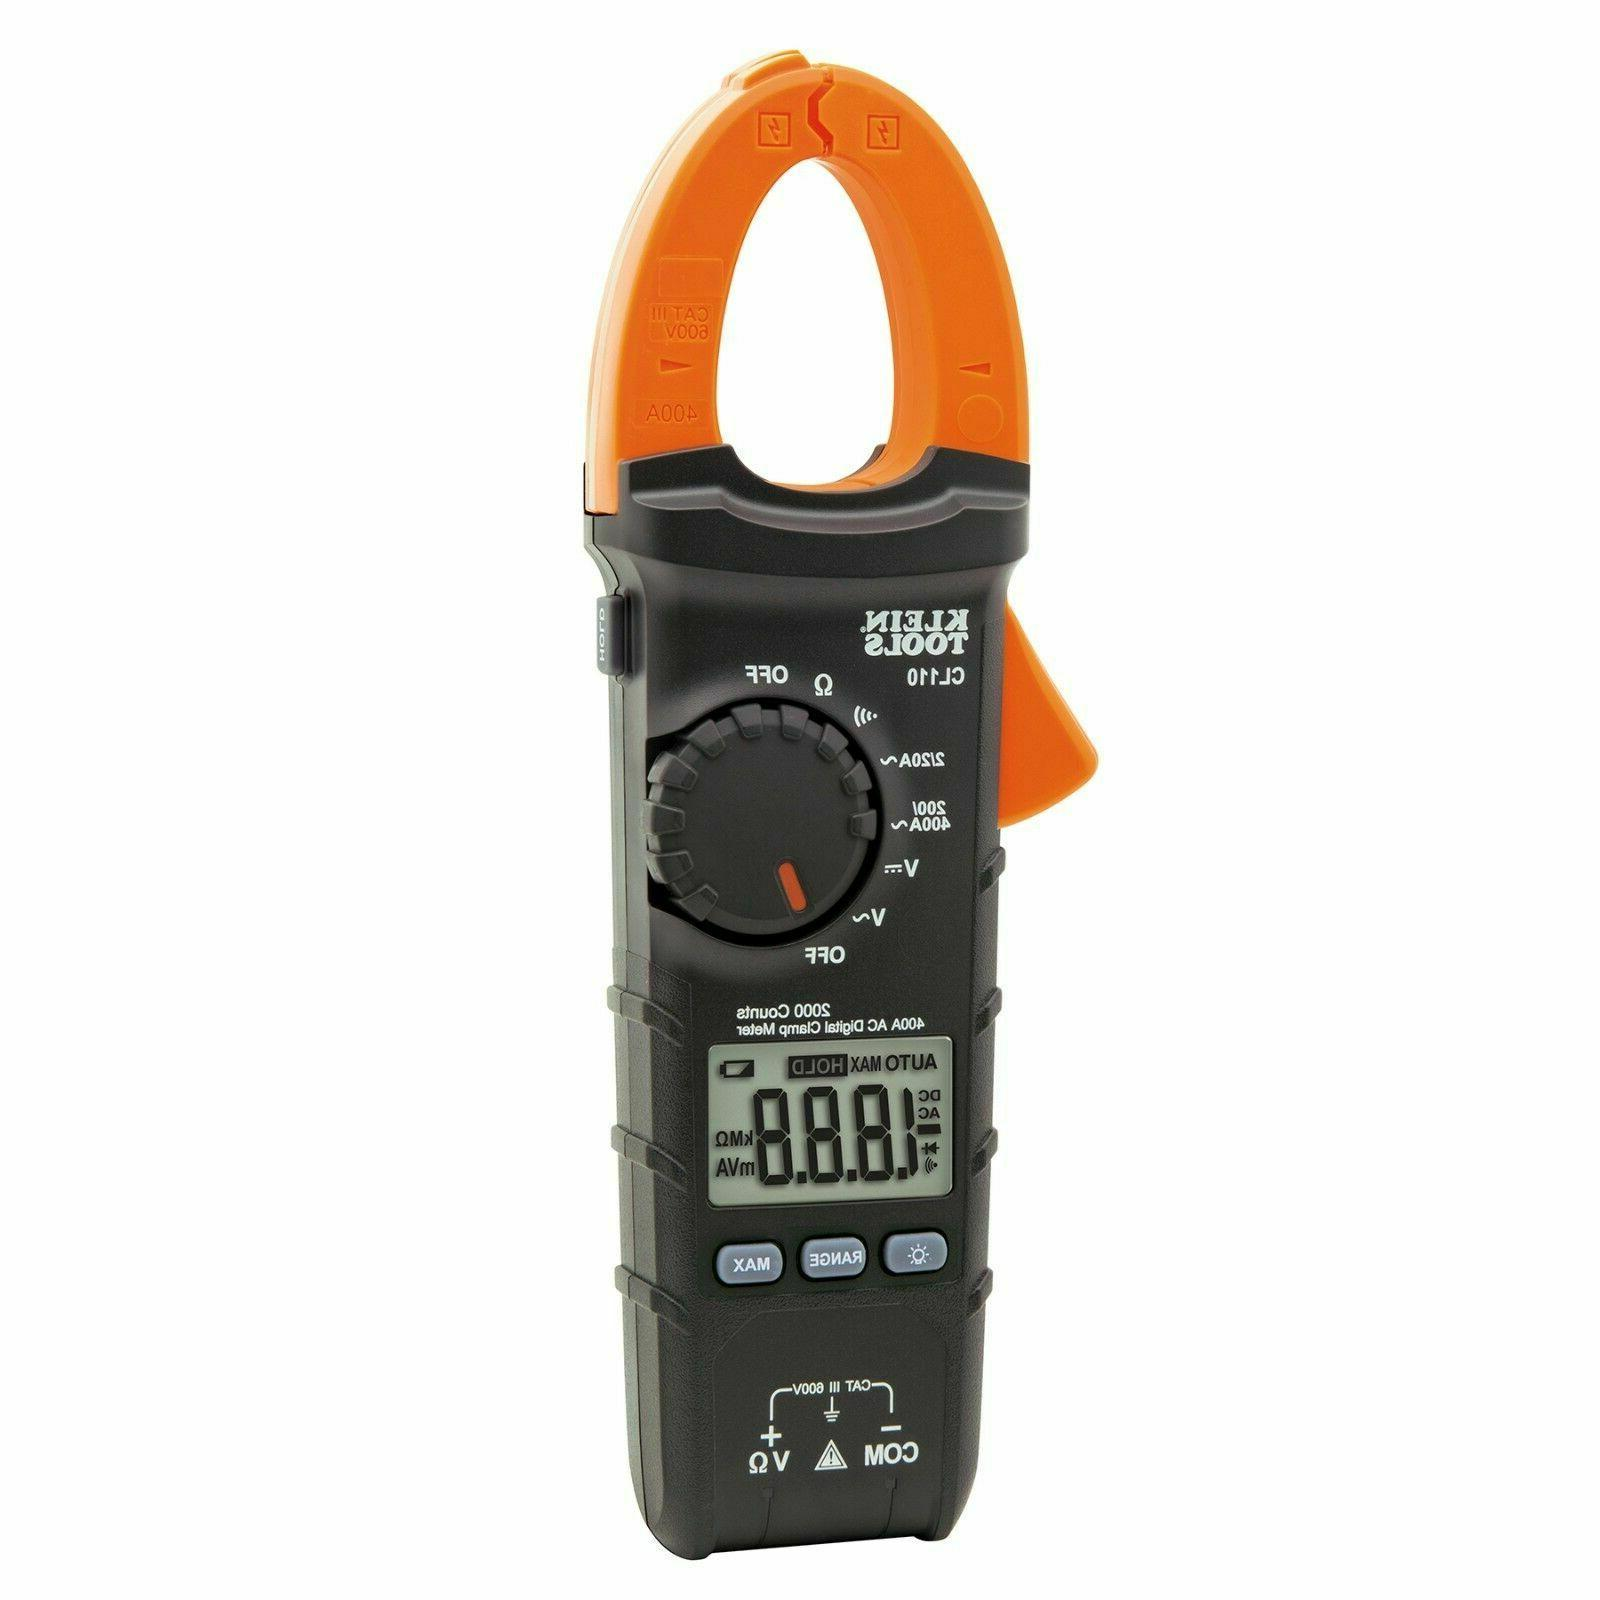 cl110 digital clamp meter ac auto ranging